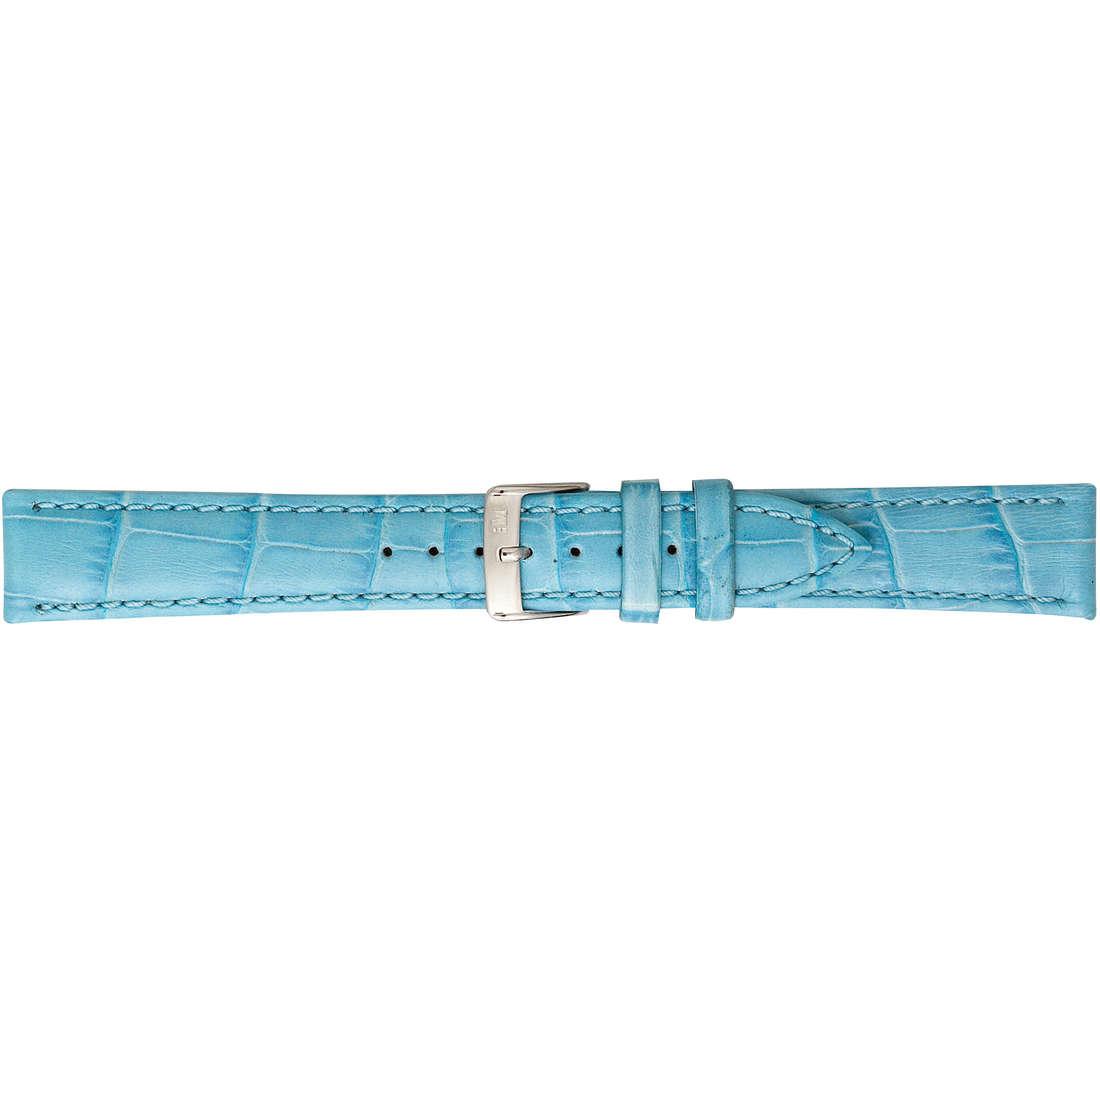 watch watch bands watch straps man Morellato Morellato 1930 A01X2269480168CR18